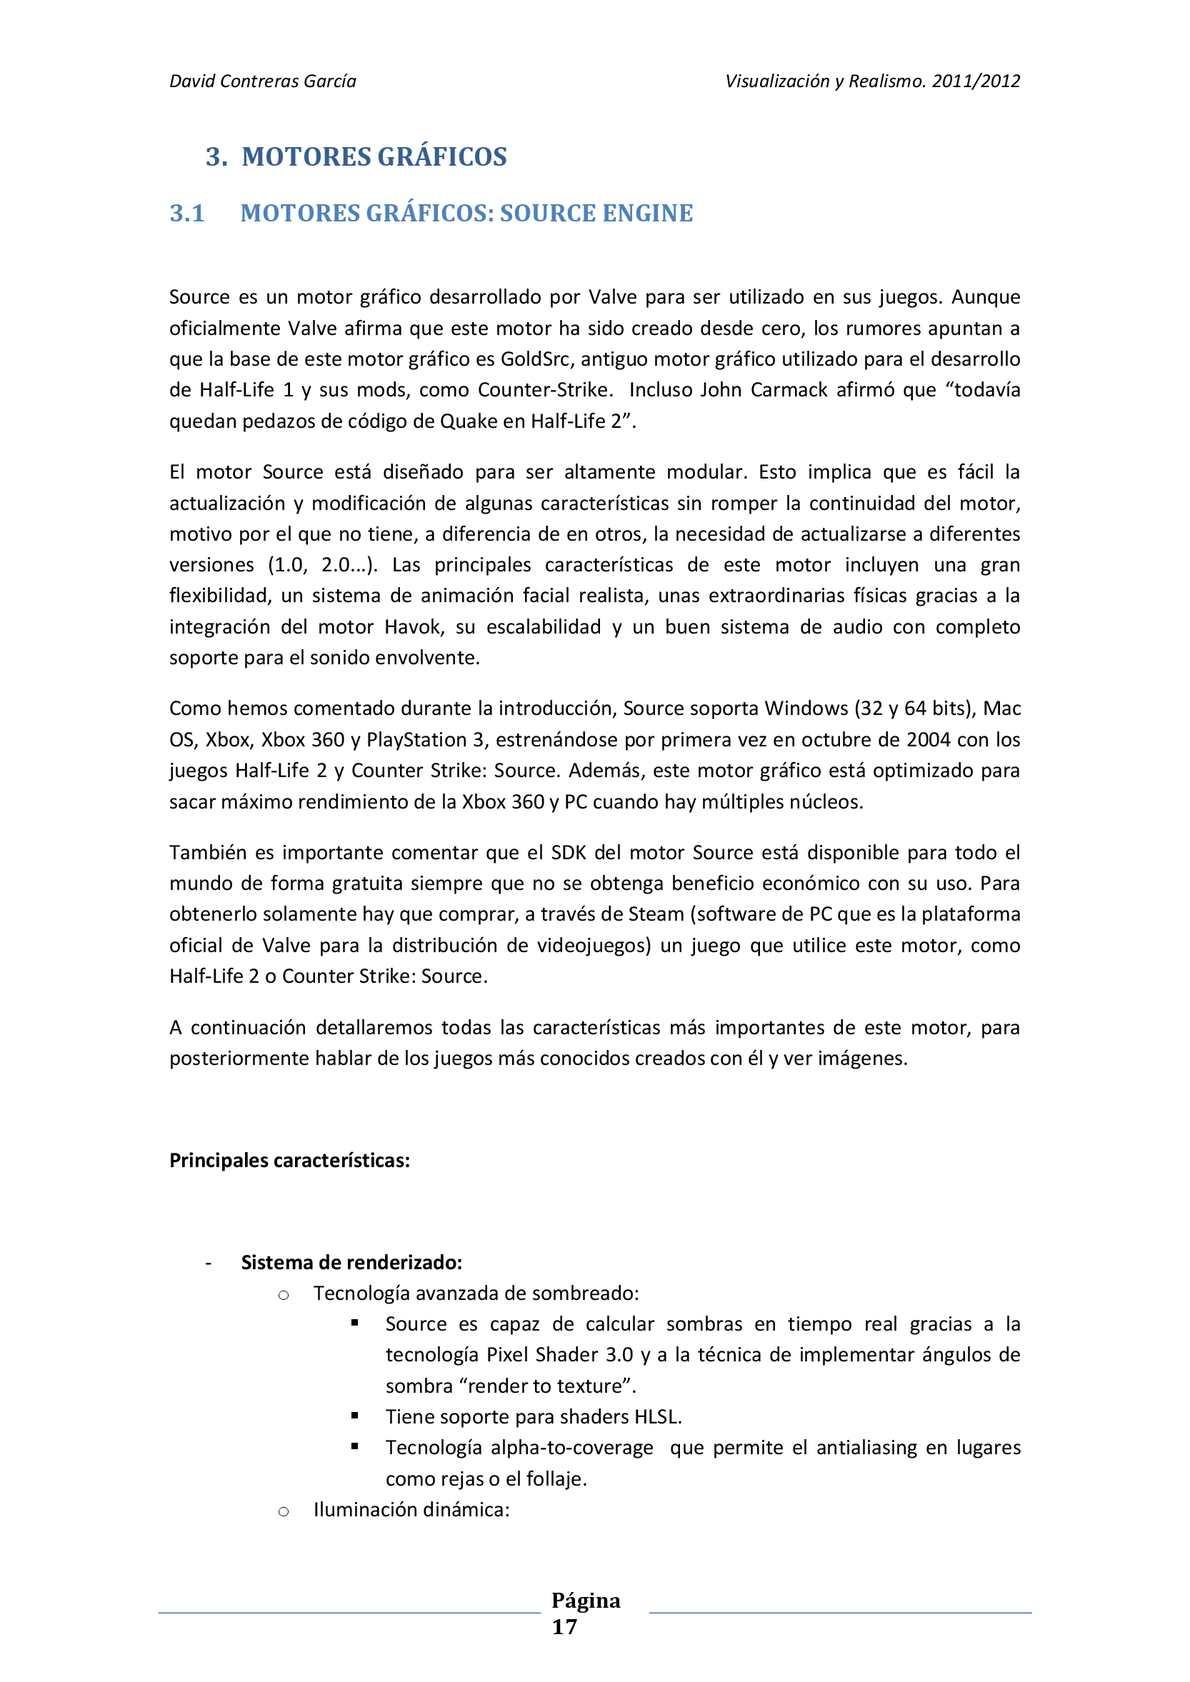 Motores Gráficos - CALAMEO Downloader